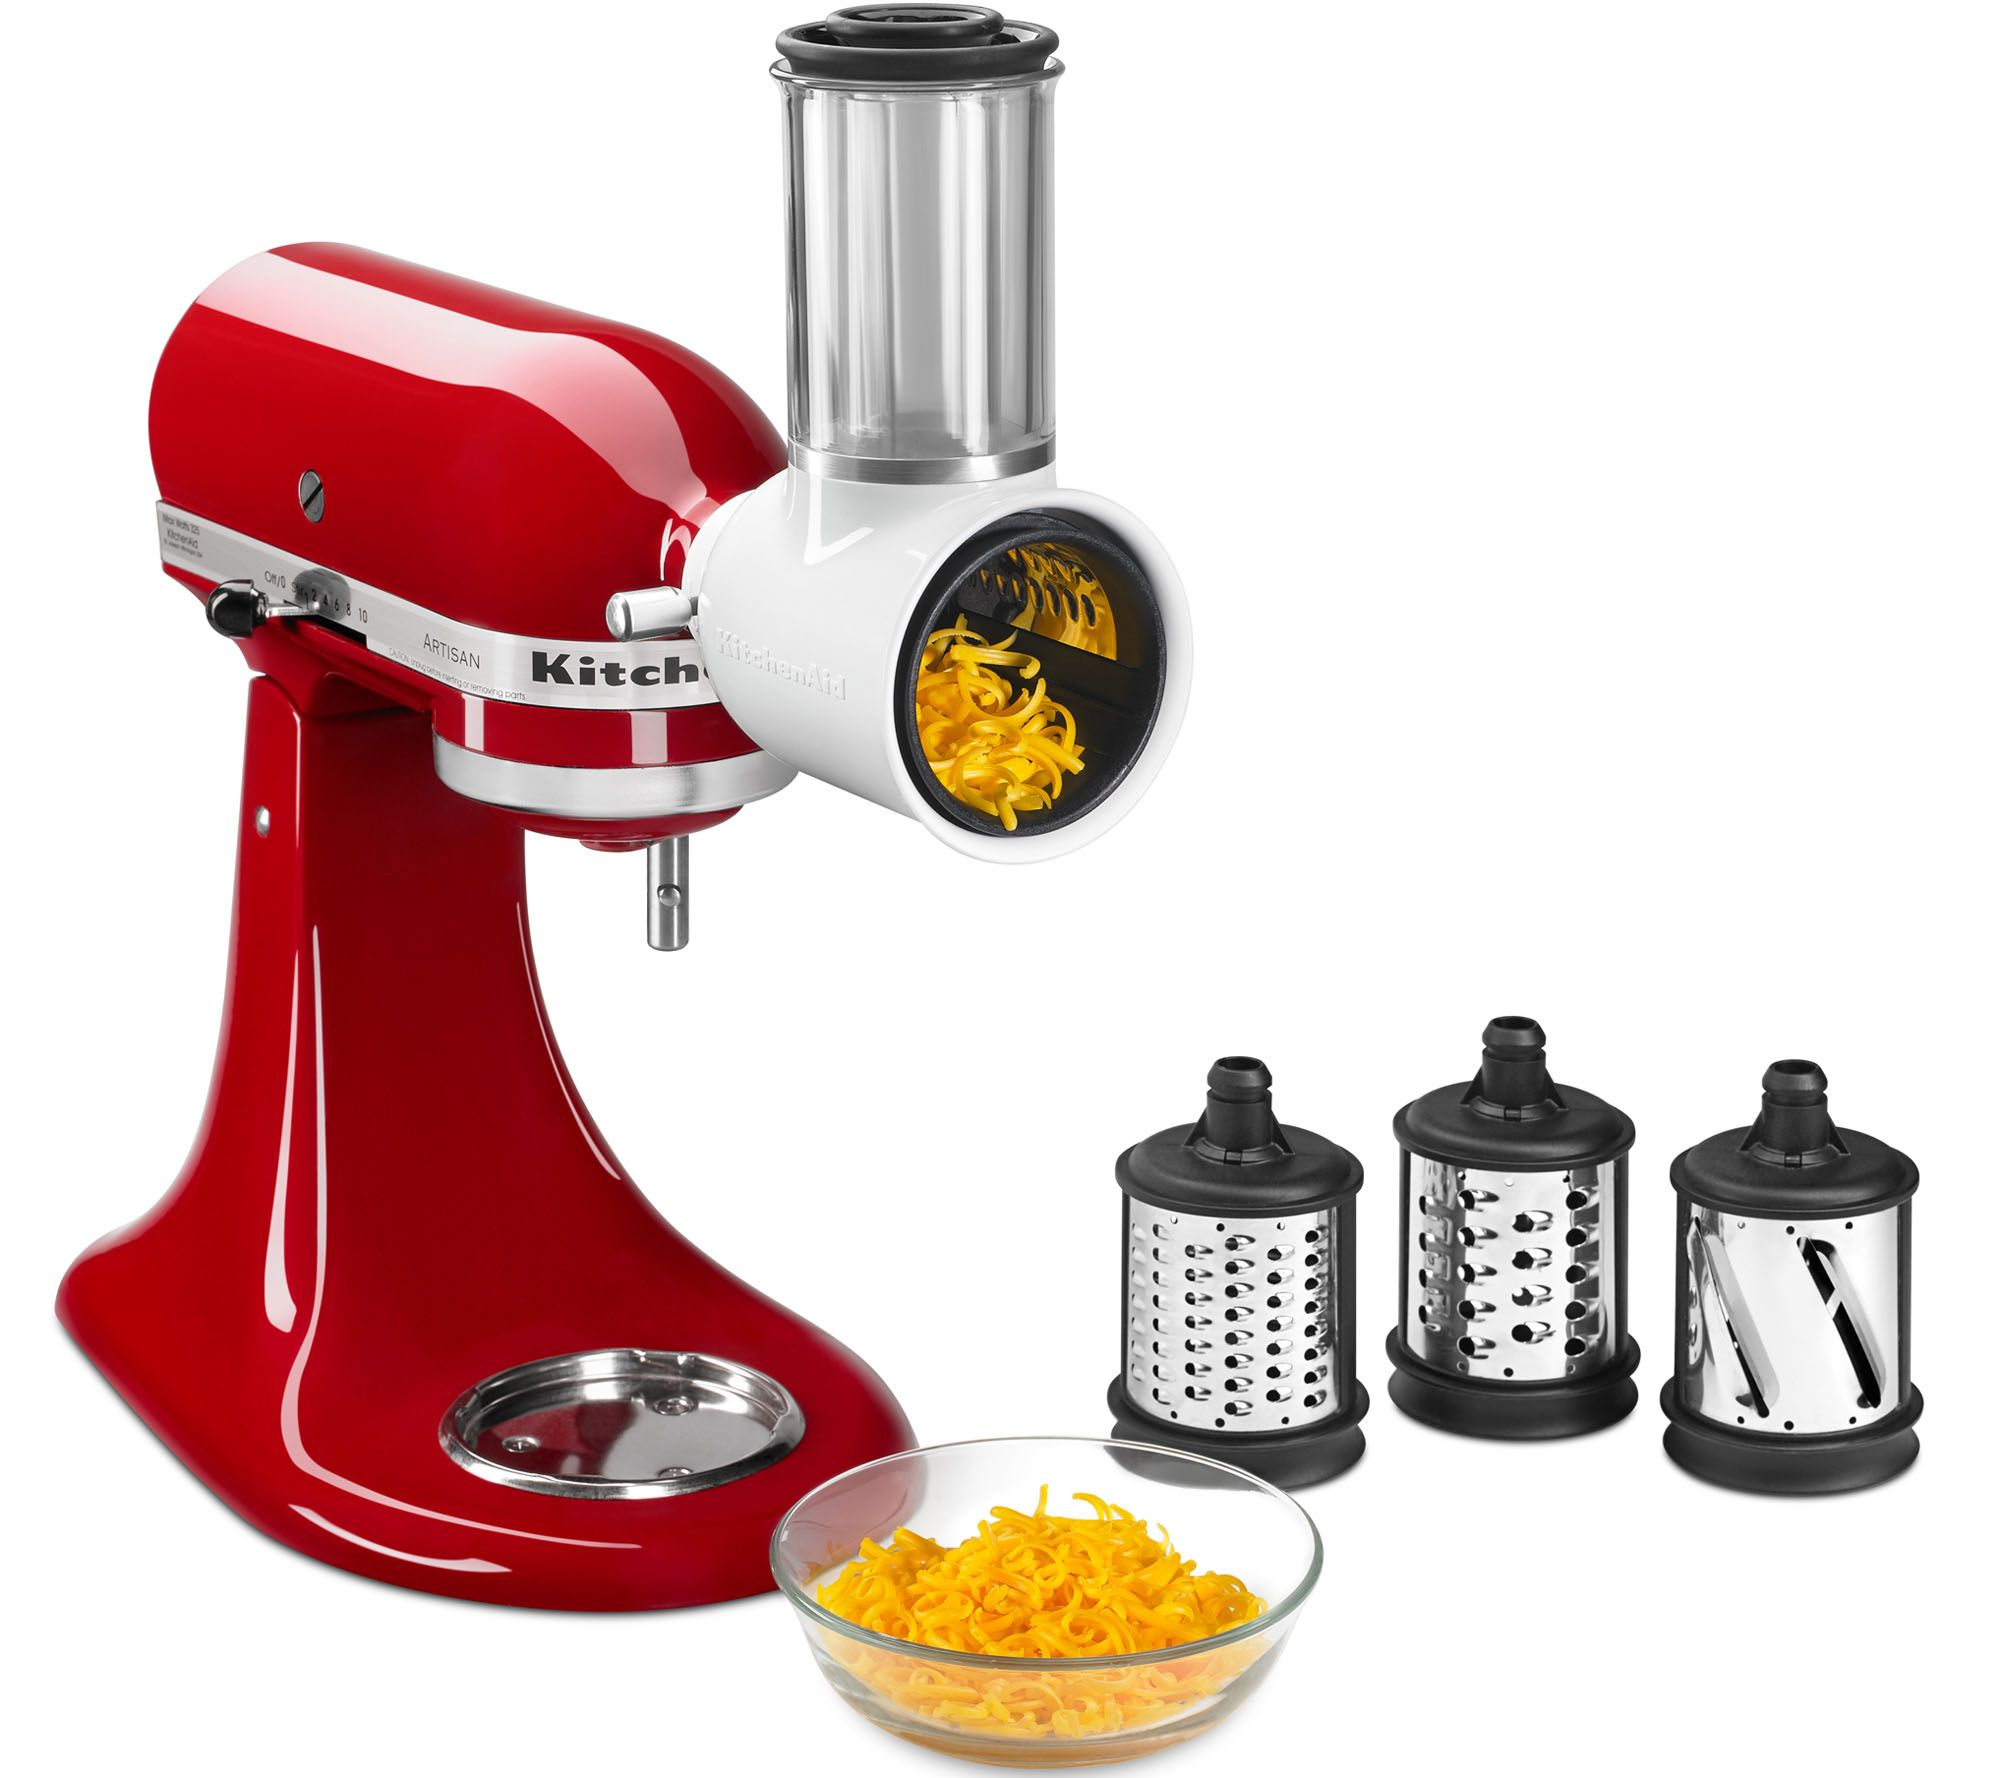 Kitchenaid Fresh Prep Stand Mixer Attachment With Extra Blade Qvc Com